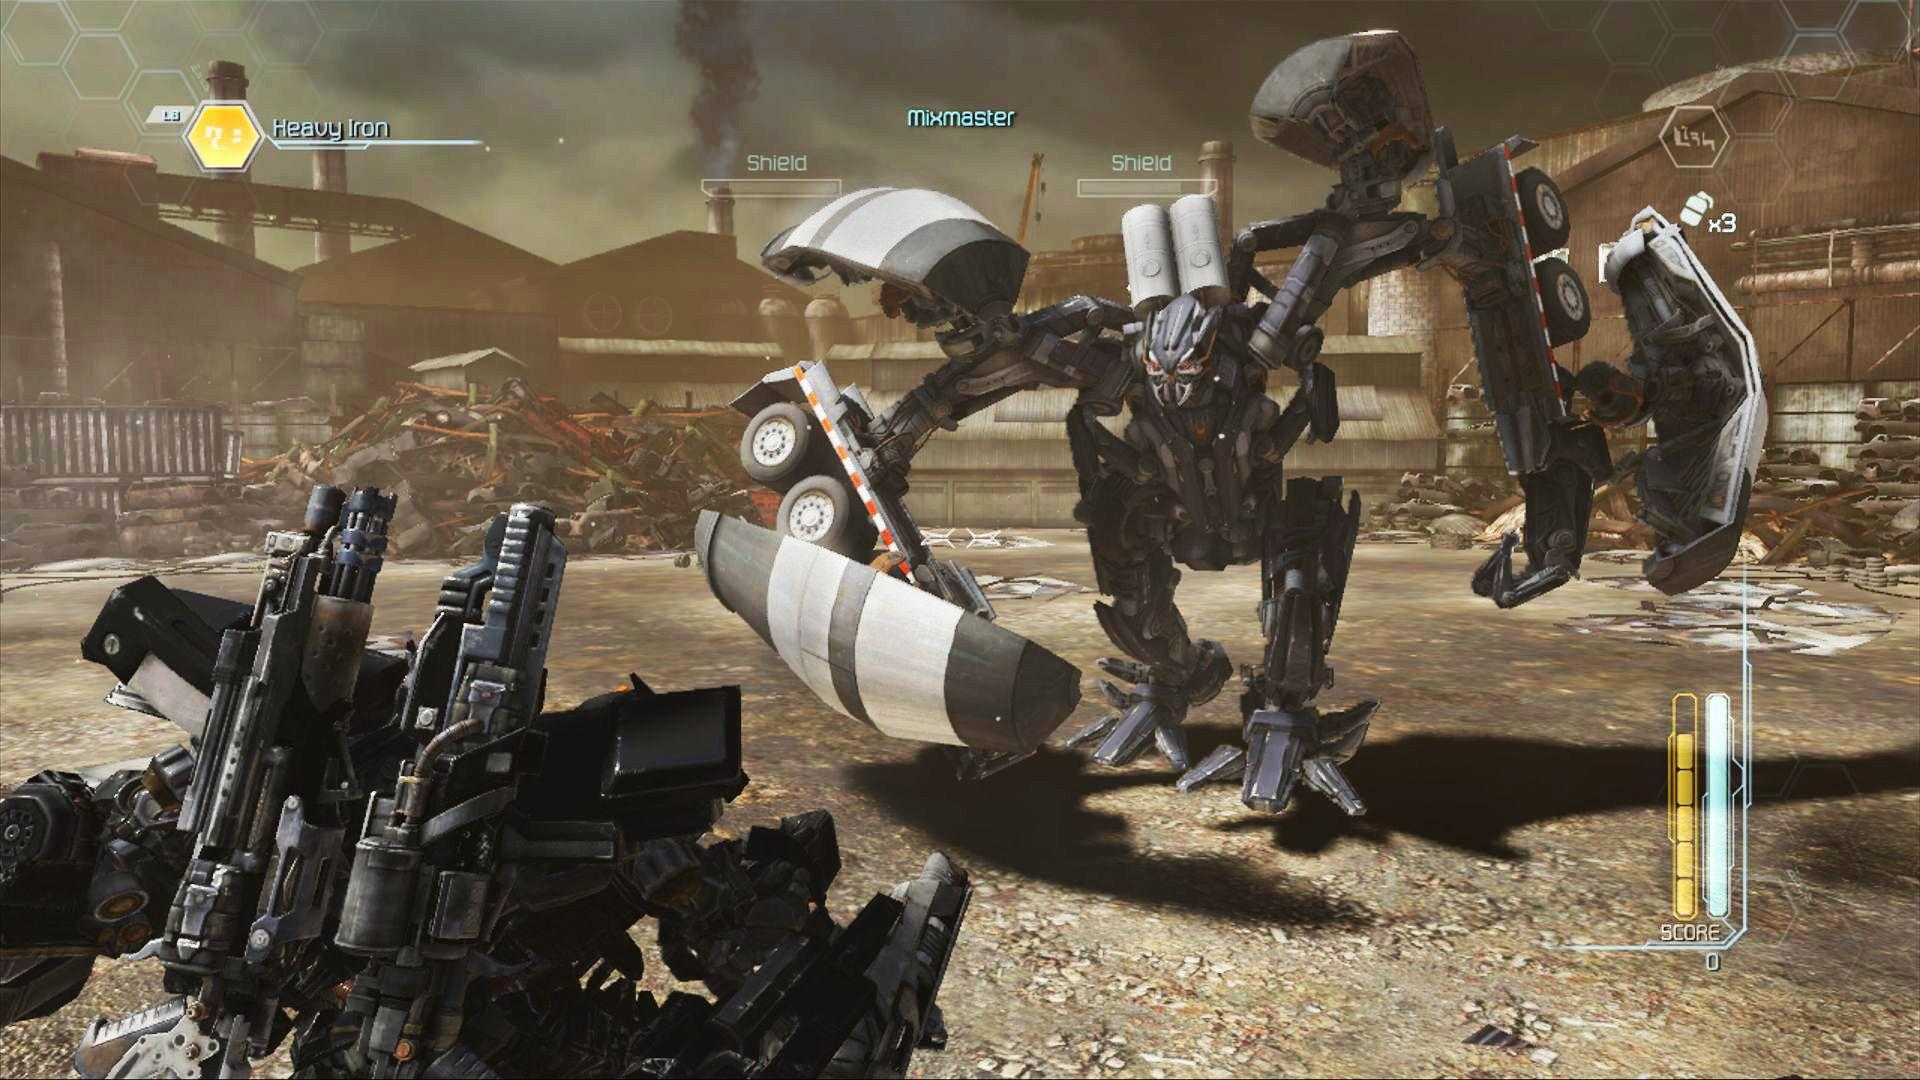 Autobot vs. Decepticon. Slik det skal være.